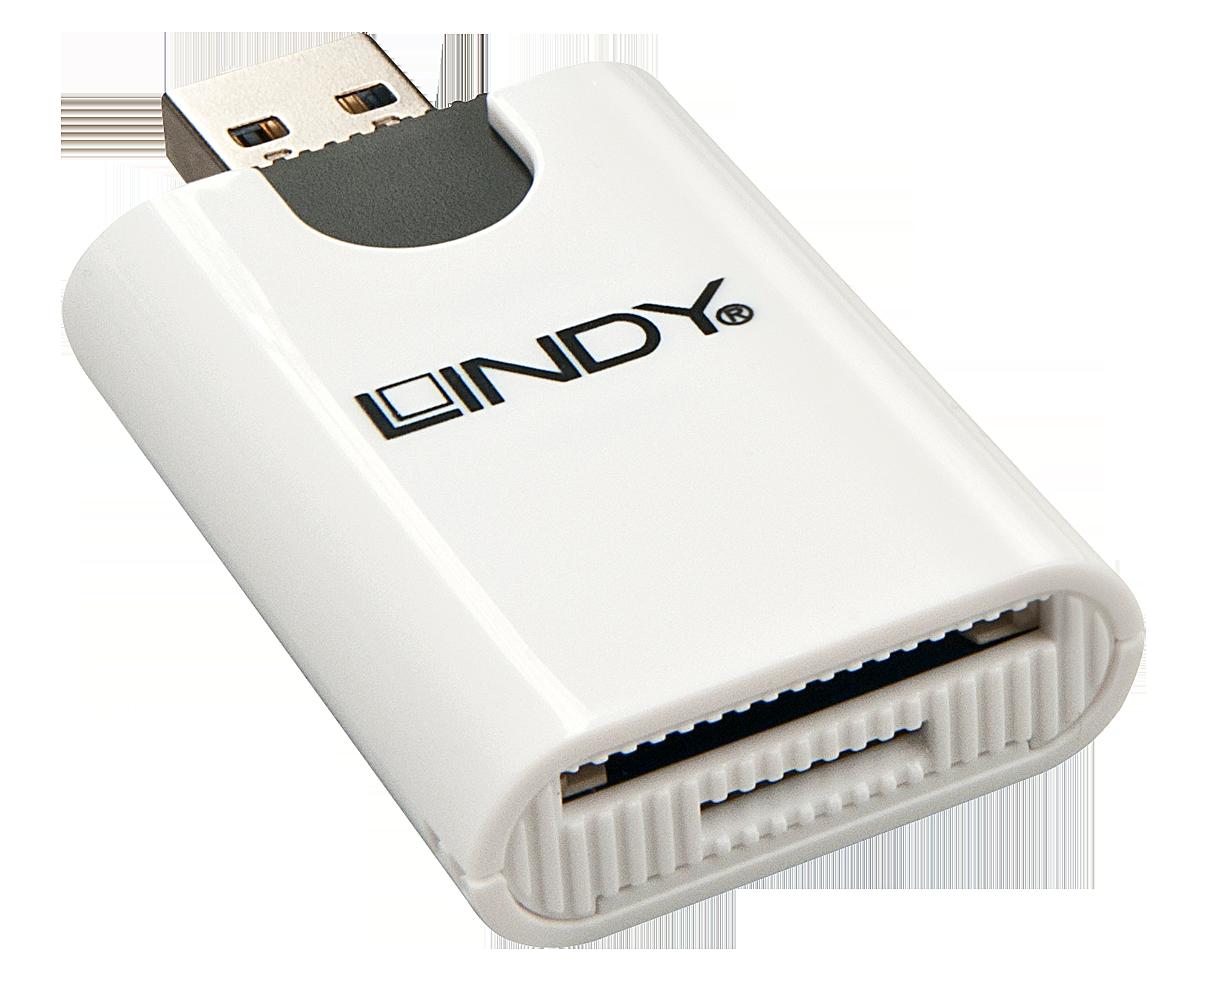 USB 3.0 SD/microSD Card Reader